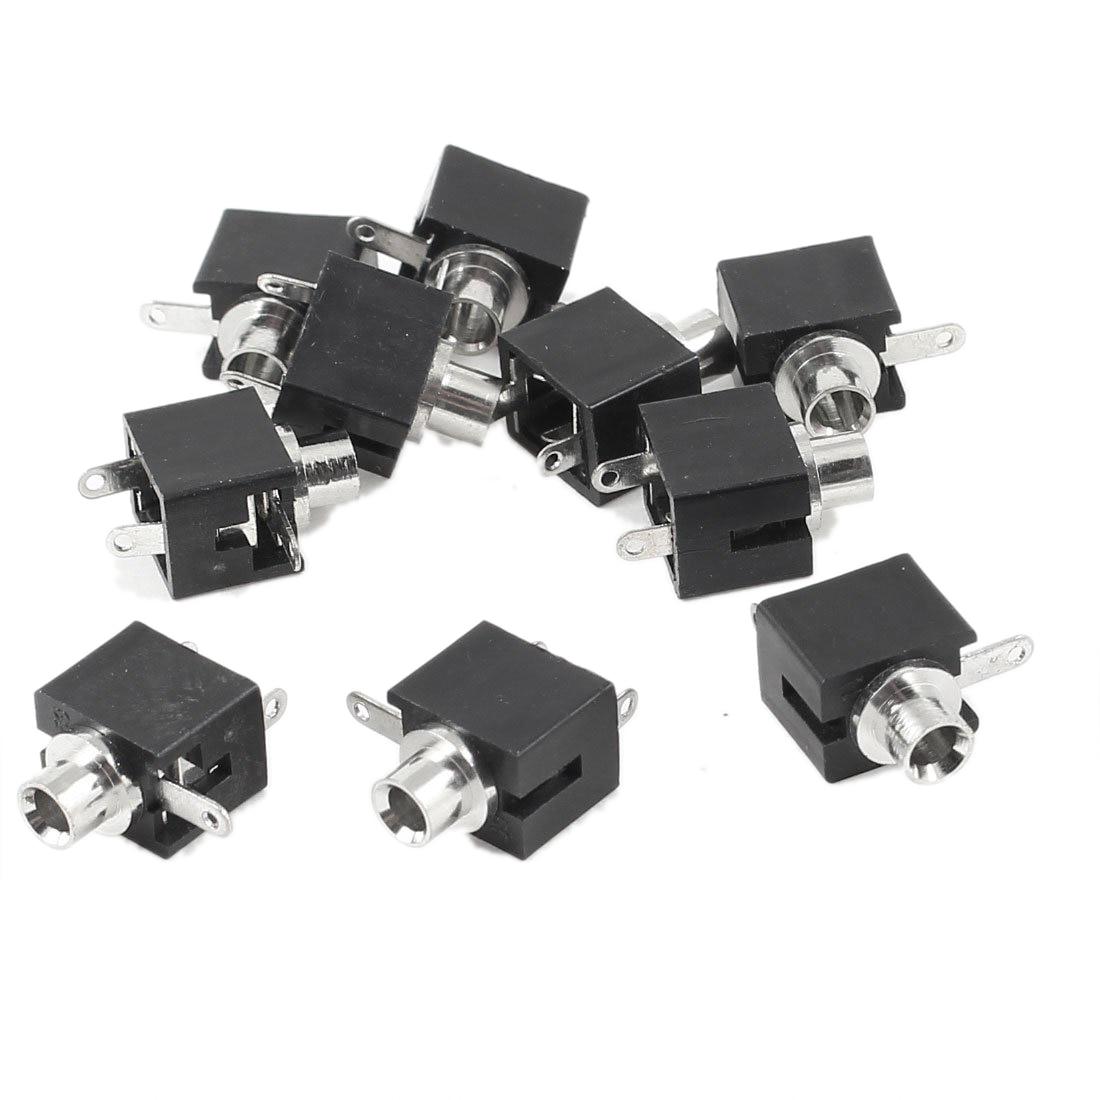 Presa da 10 pezzi per cuffie audio mono da 2,5 mm nero femmina 3 pin - Audio e video portatili